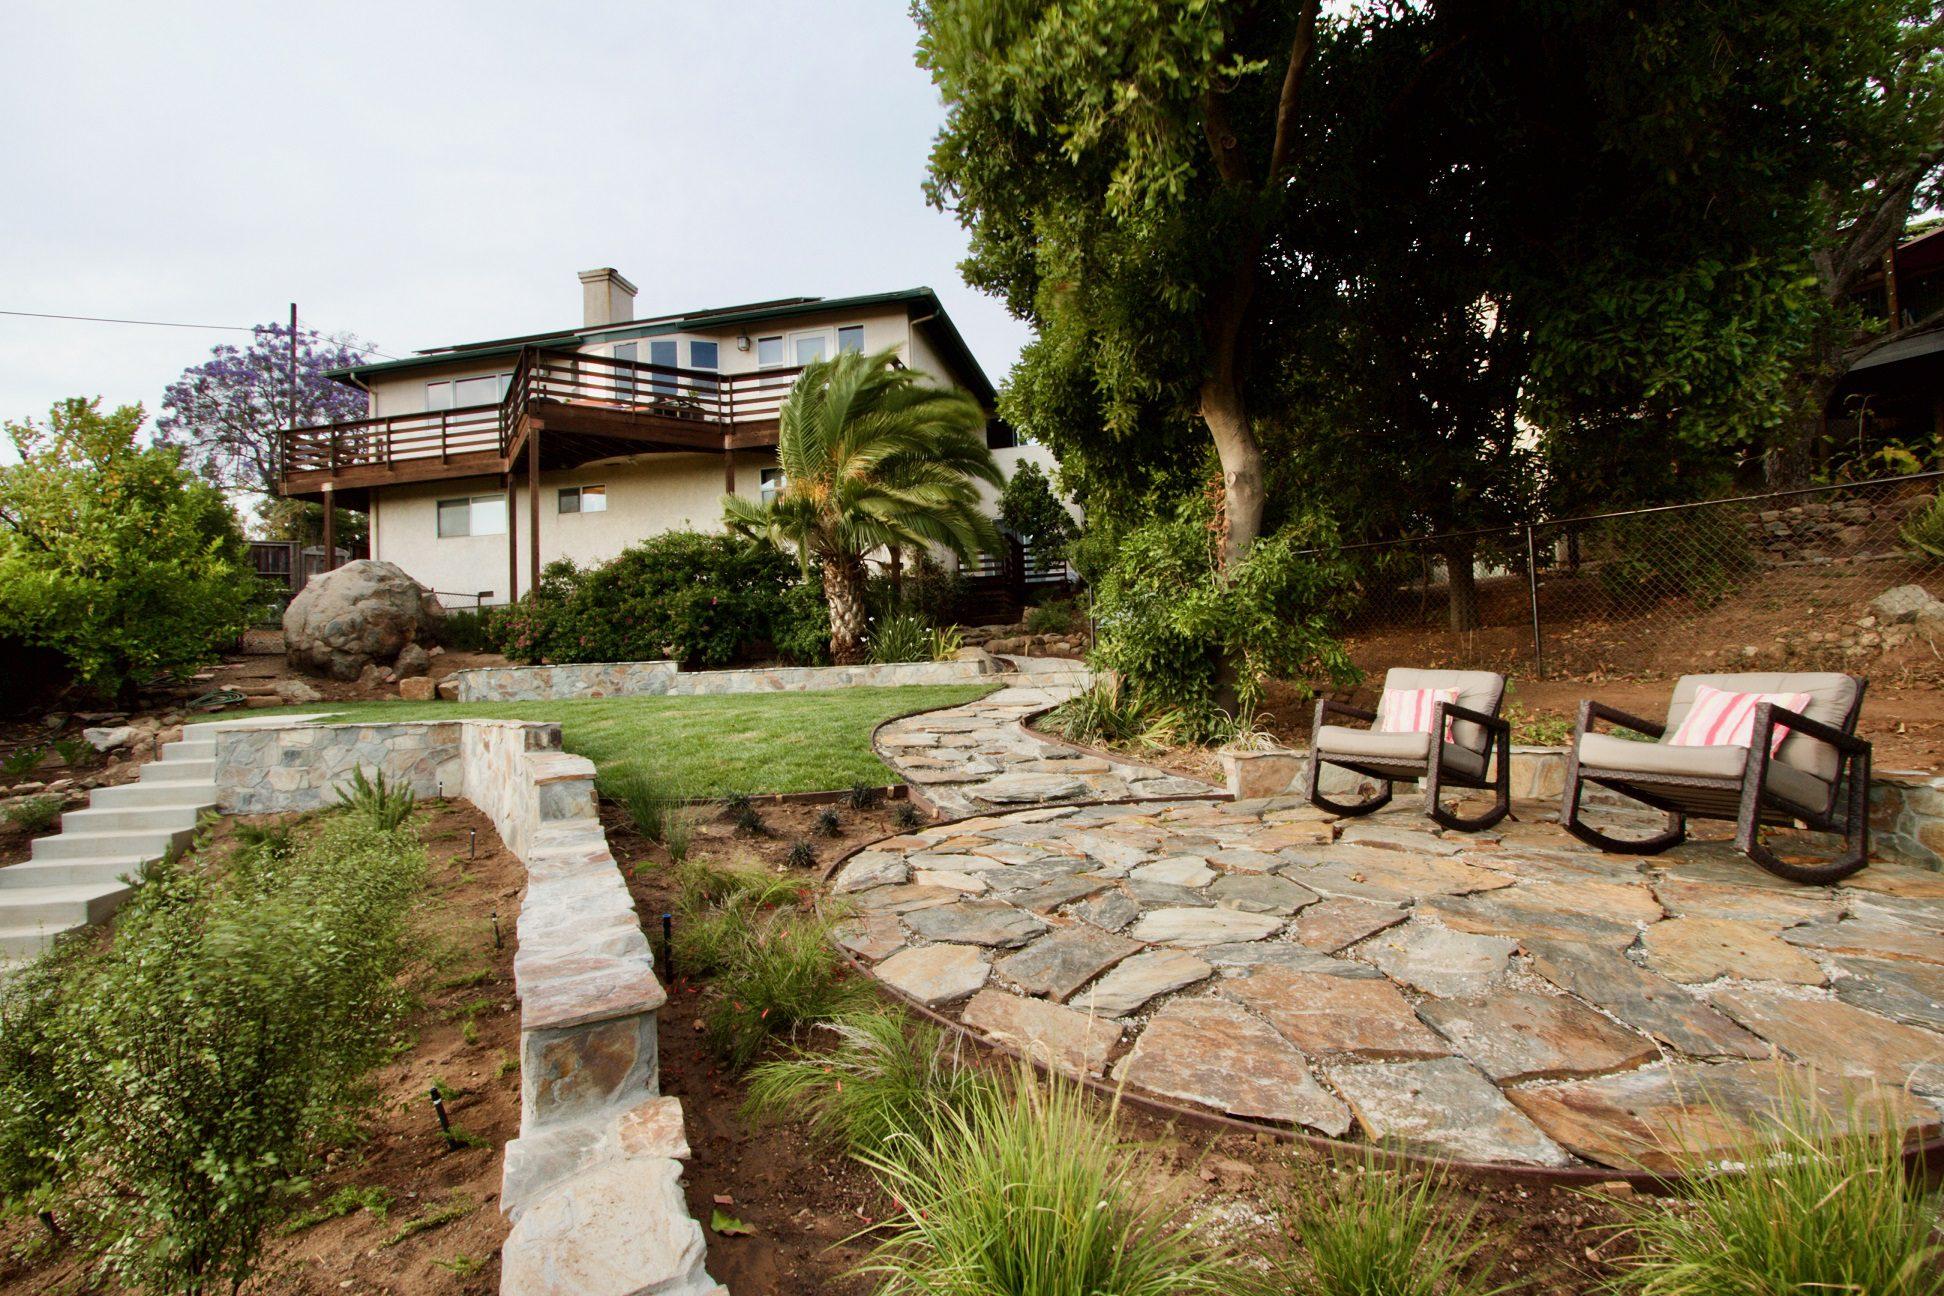 Bonavista Natural Stone Veneer Retaining Wall and Flagstone Application